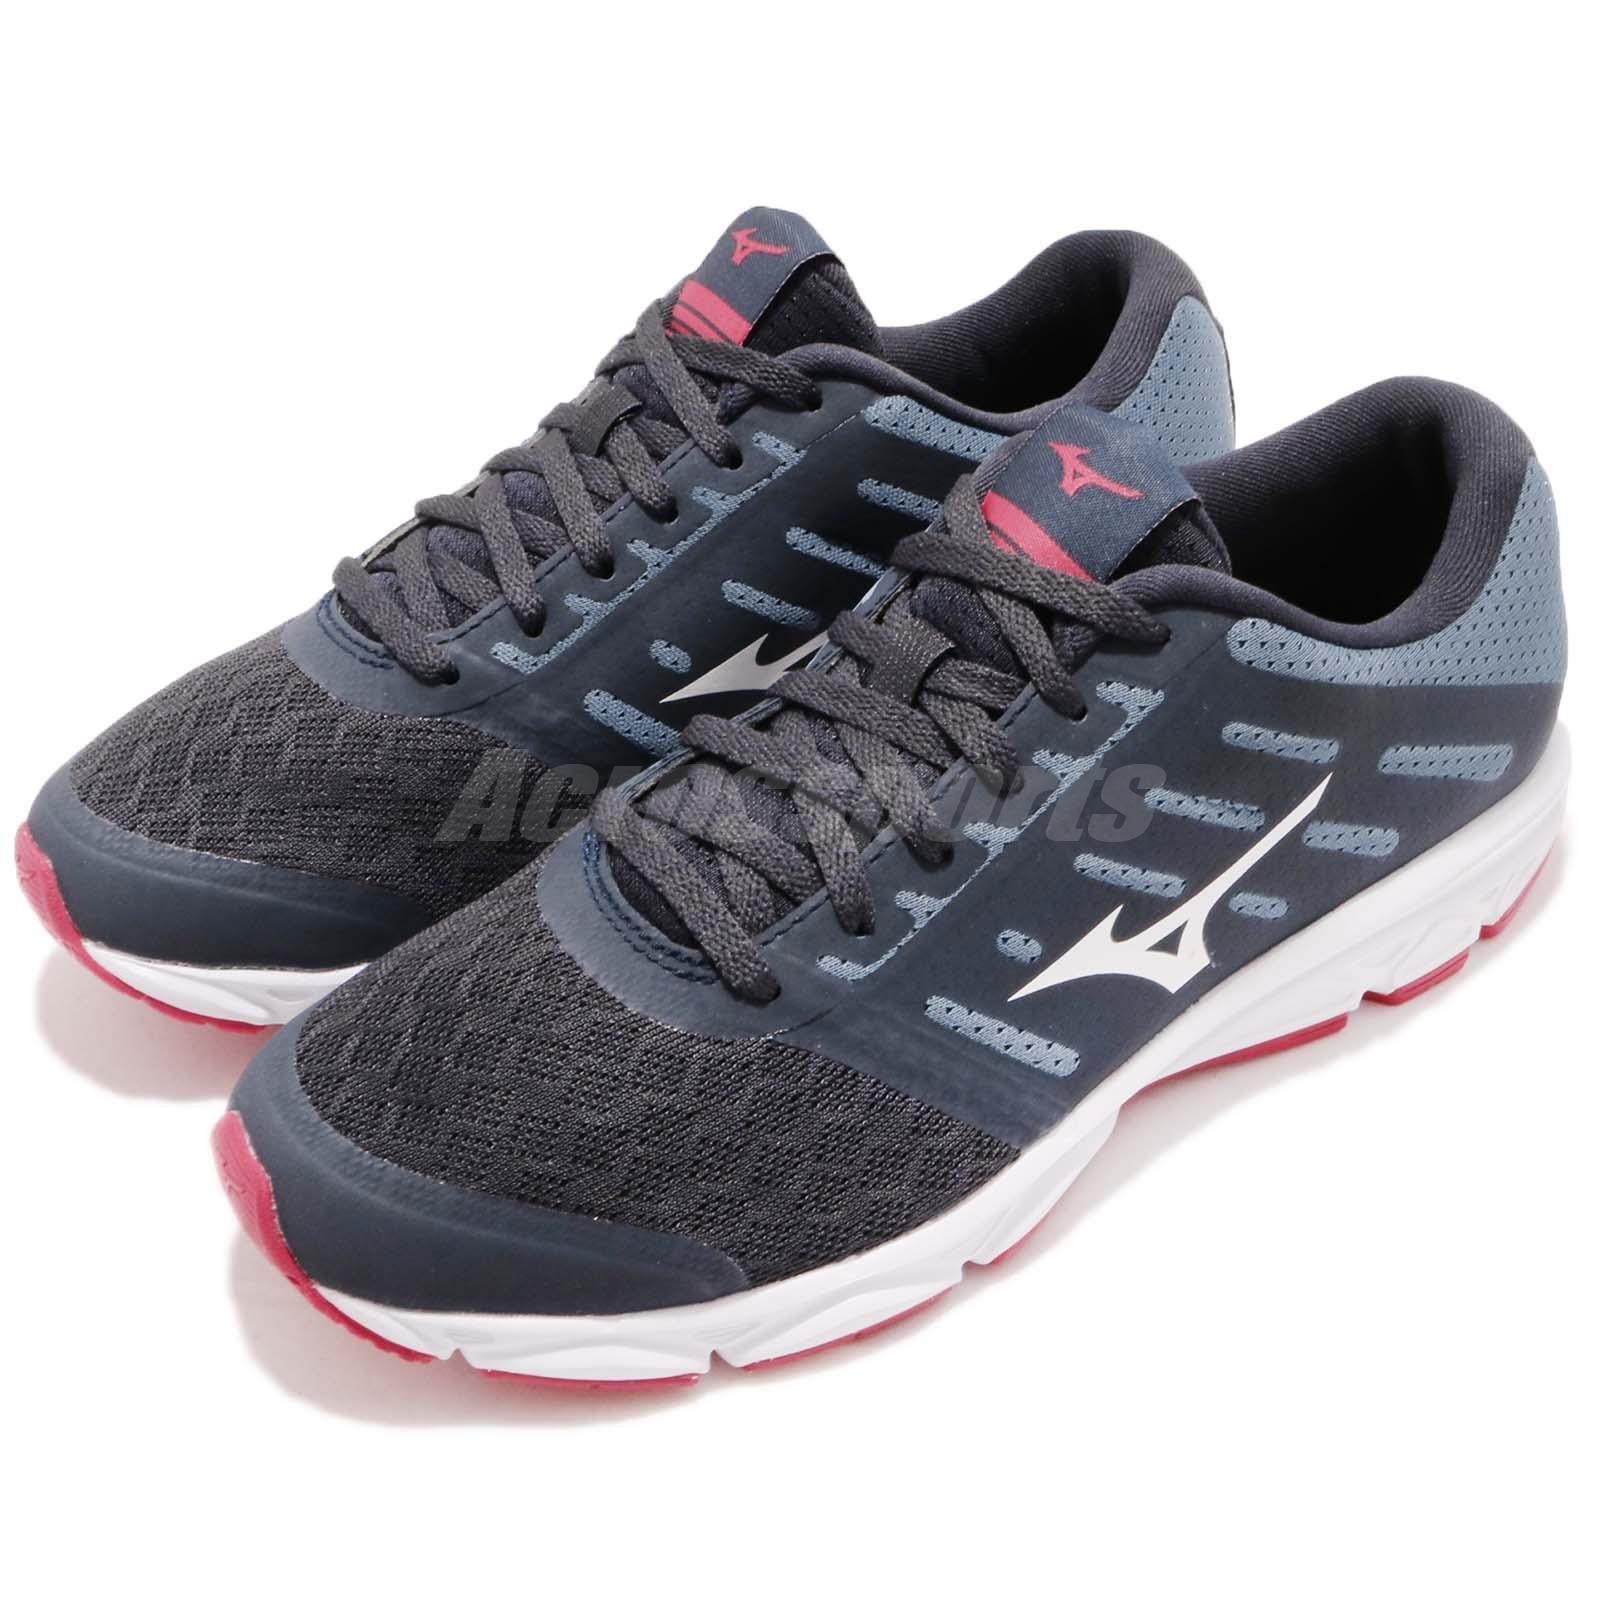 Mizuno  EZRun Grey blueee White Red Women Running Training shoes Sneaker J1GF1838-07  up to 42% off